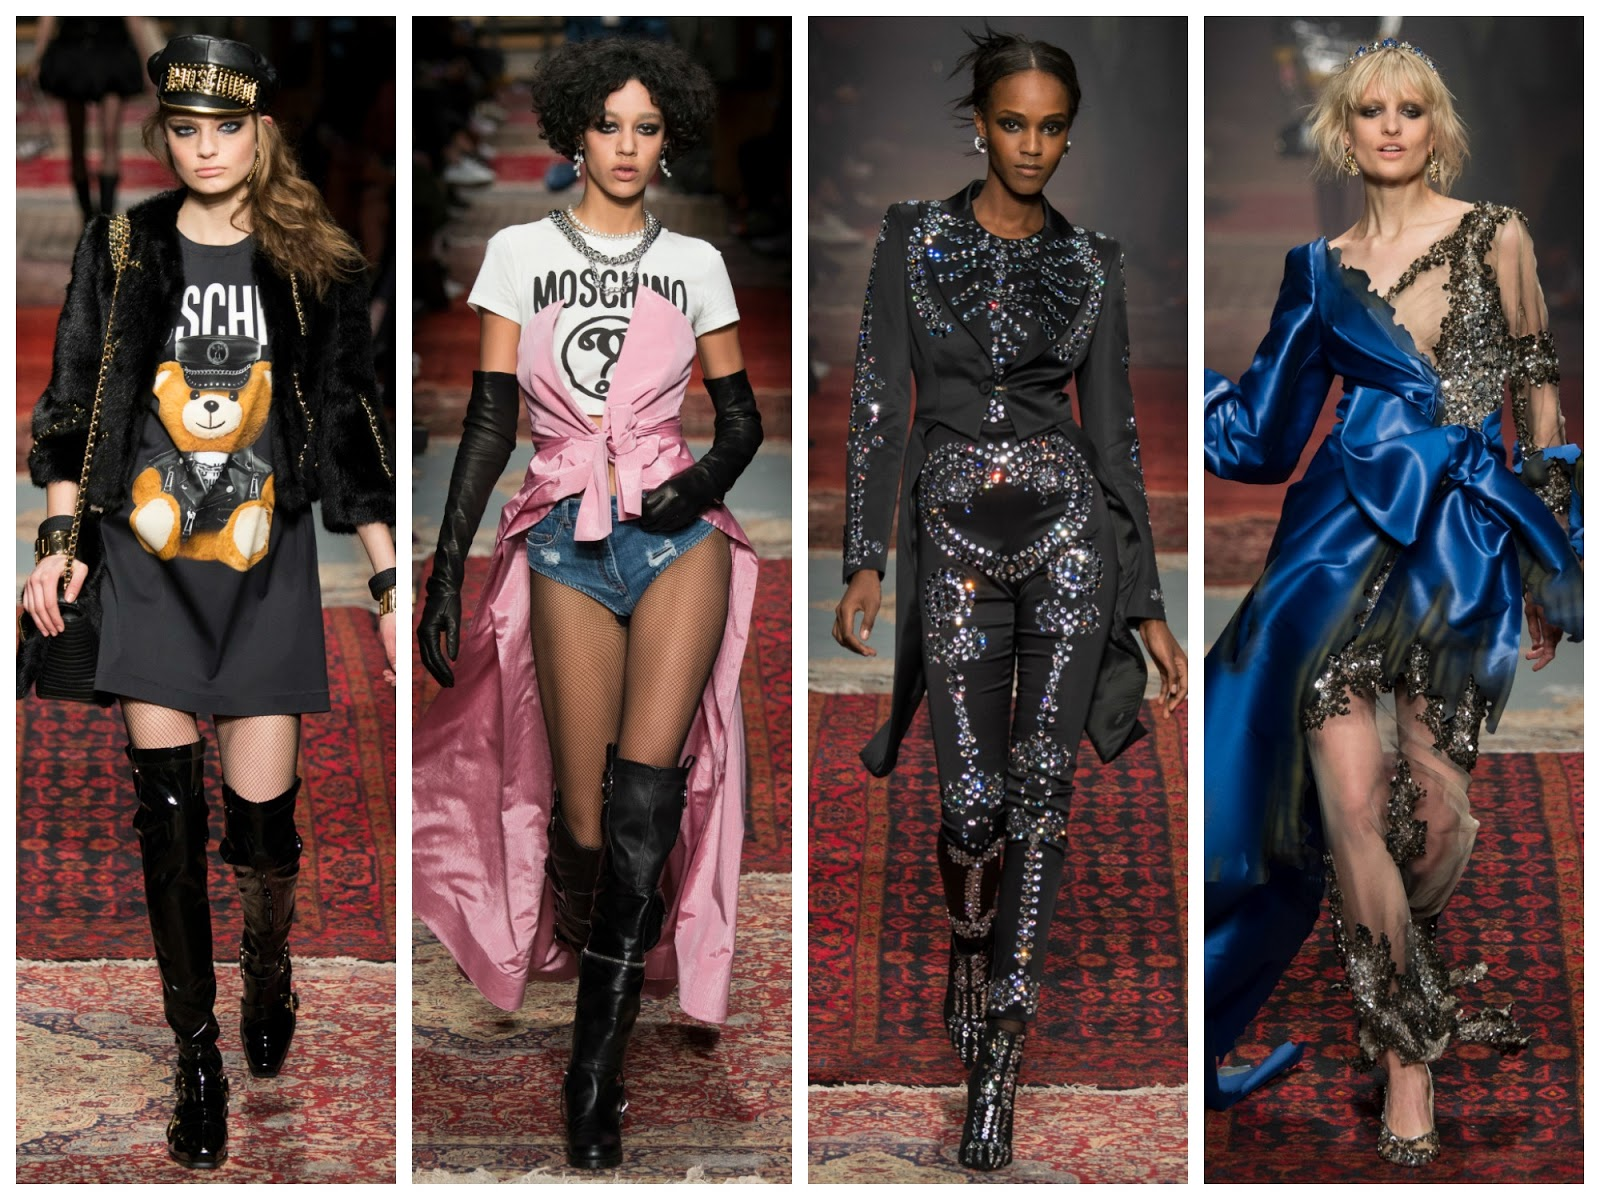 moschino-fall-winter-2016-fashion-show-collection-milan